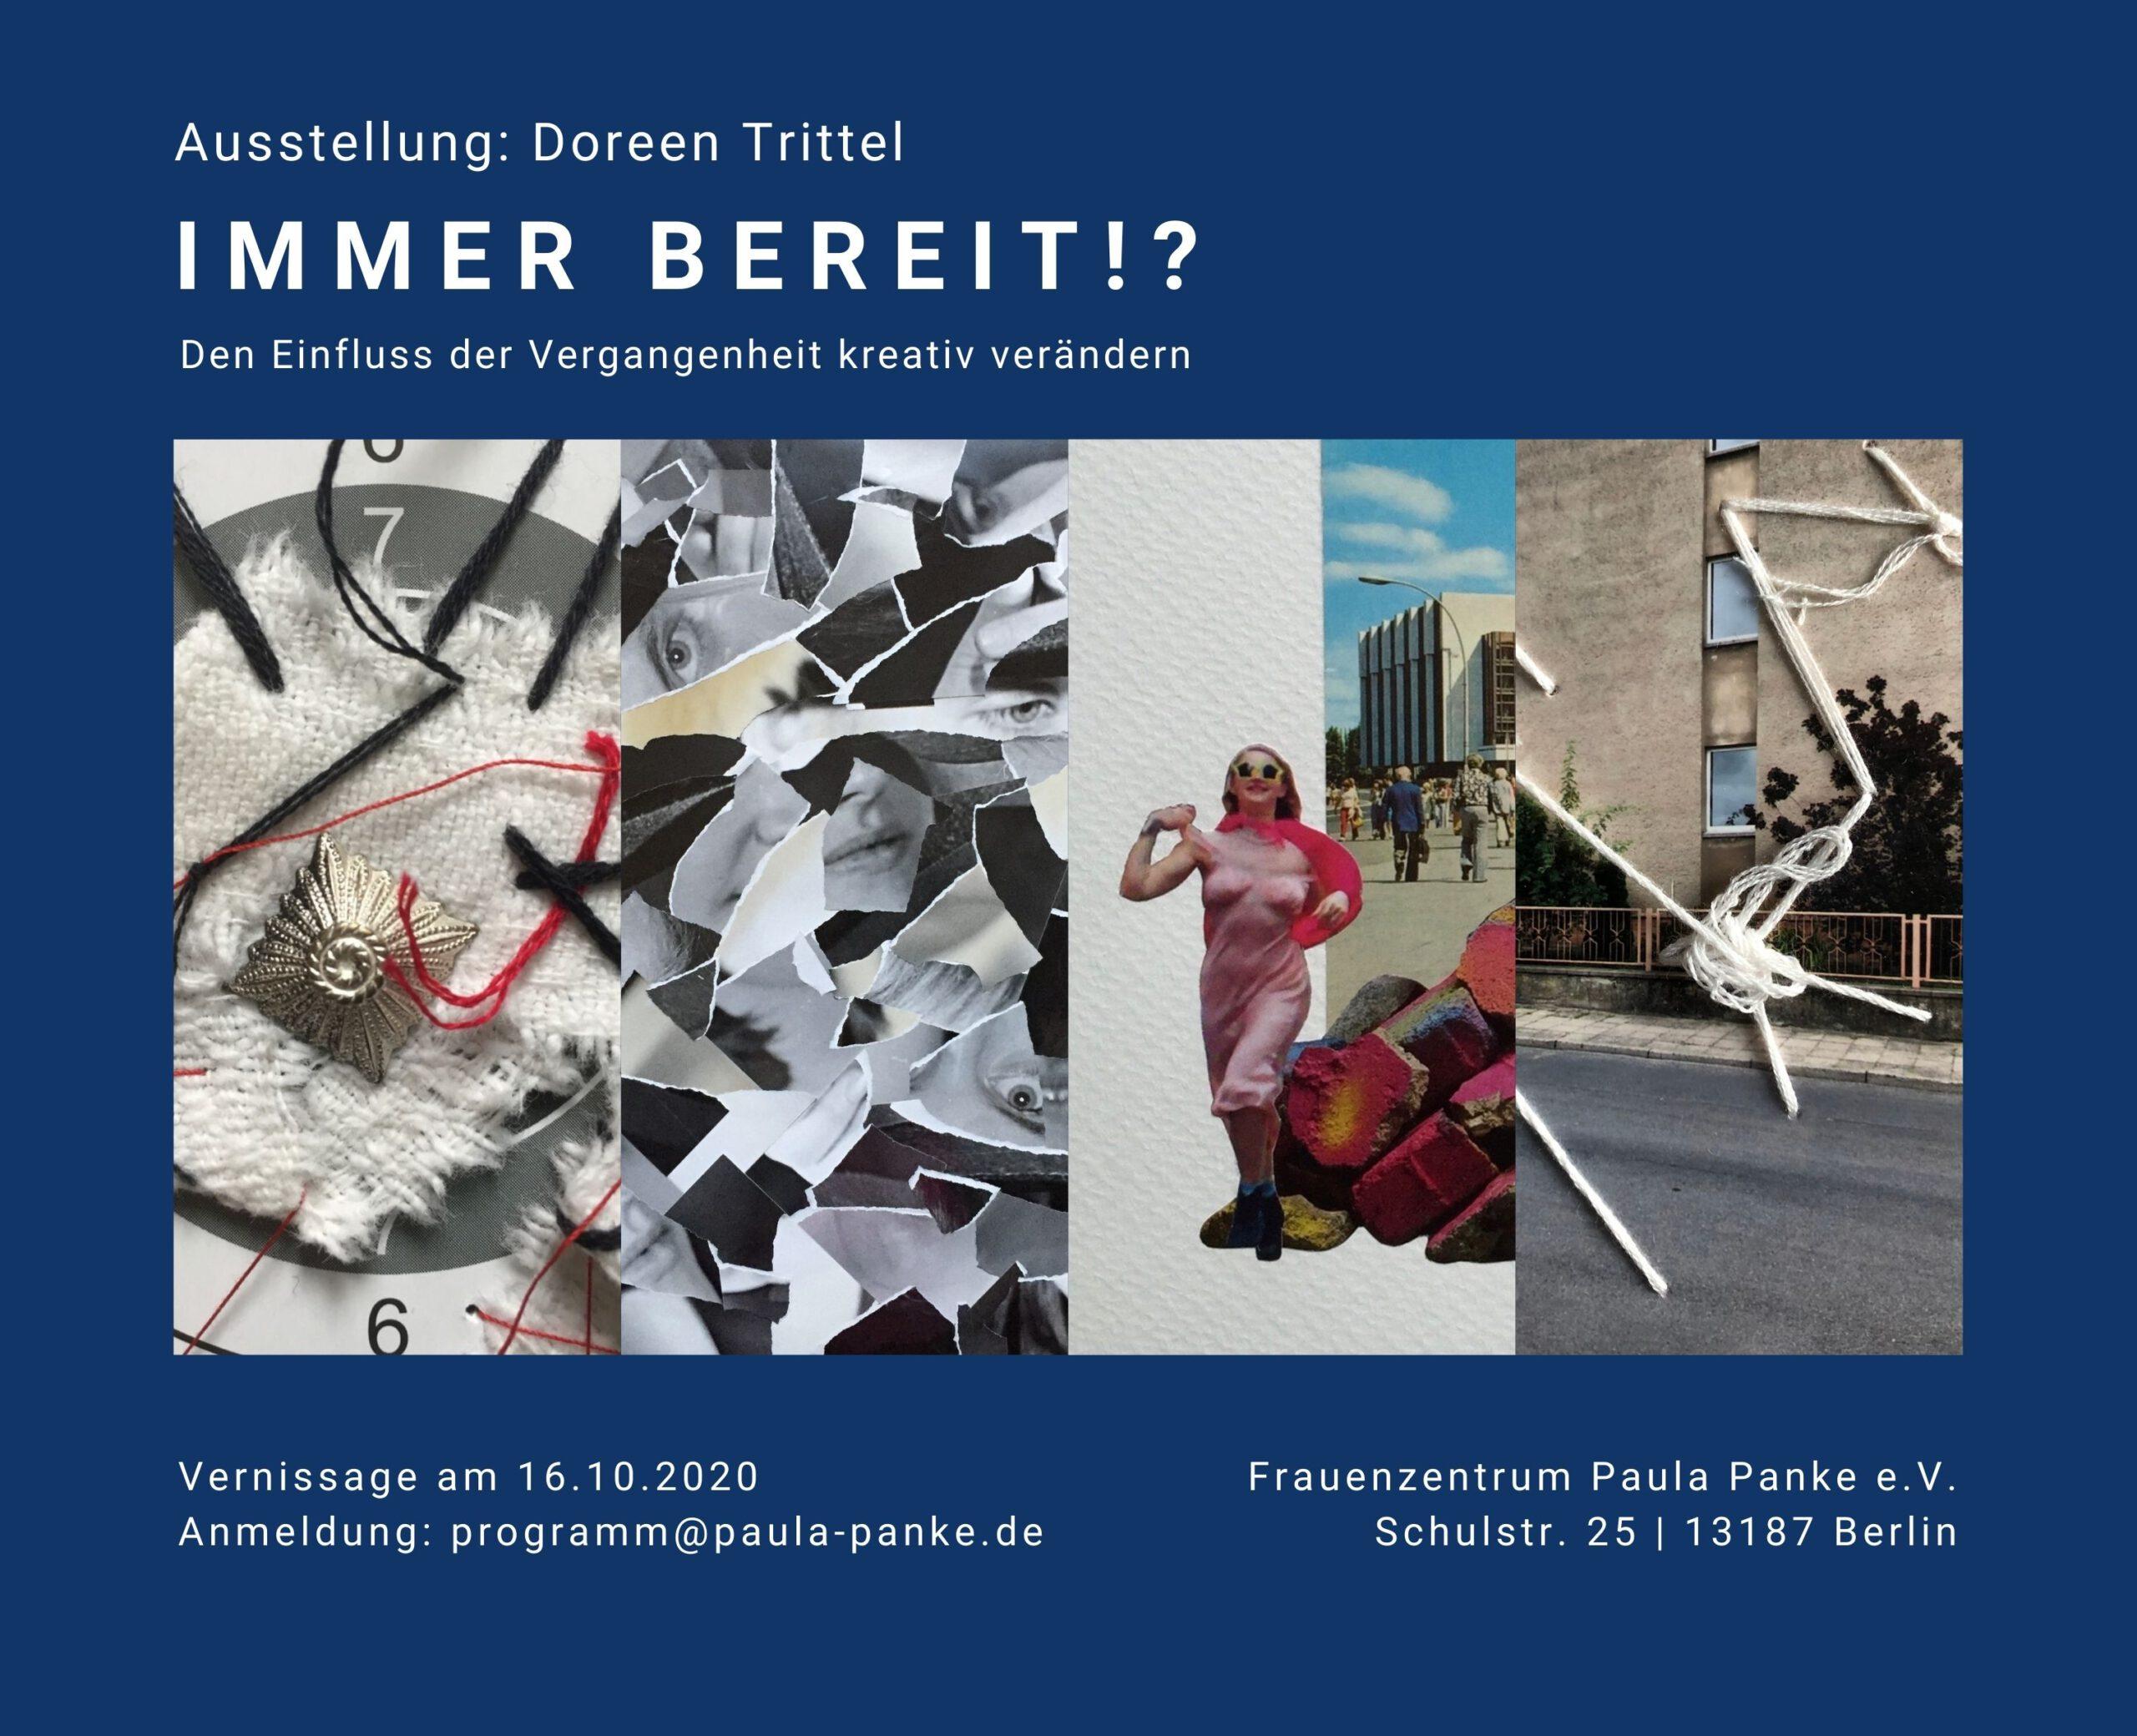 Postkartengrüße aus Berlin 15/16, Collage Papier, 32 x 24 cm, 2015, (c) hehocra